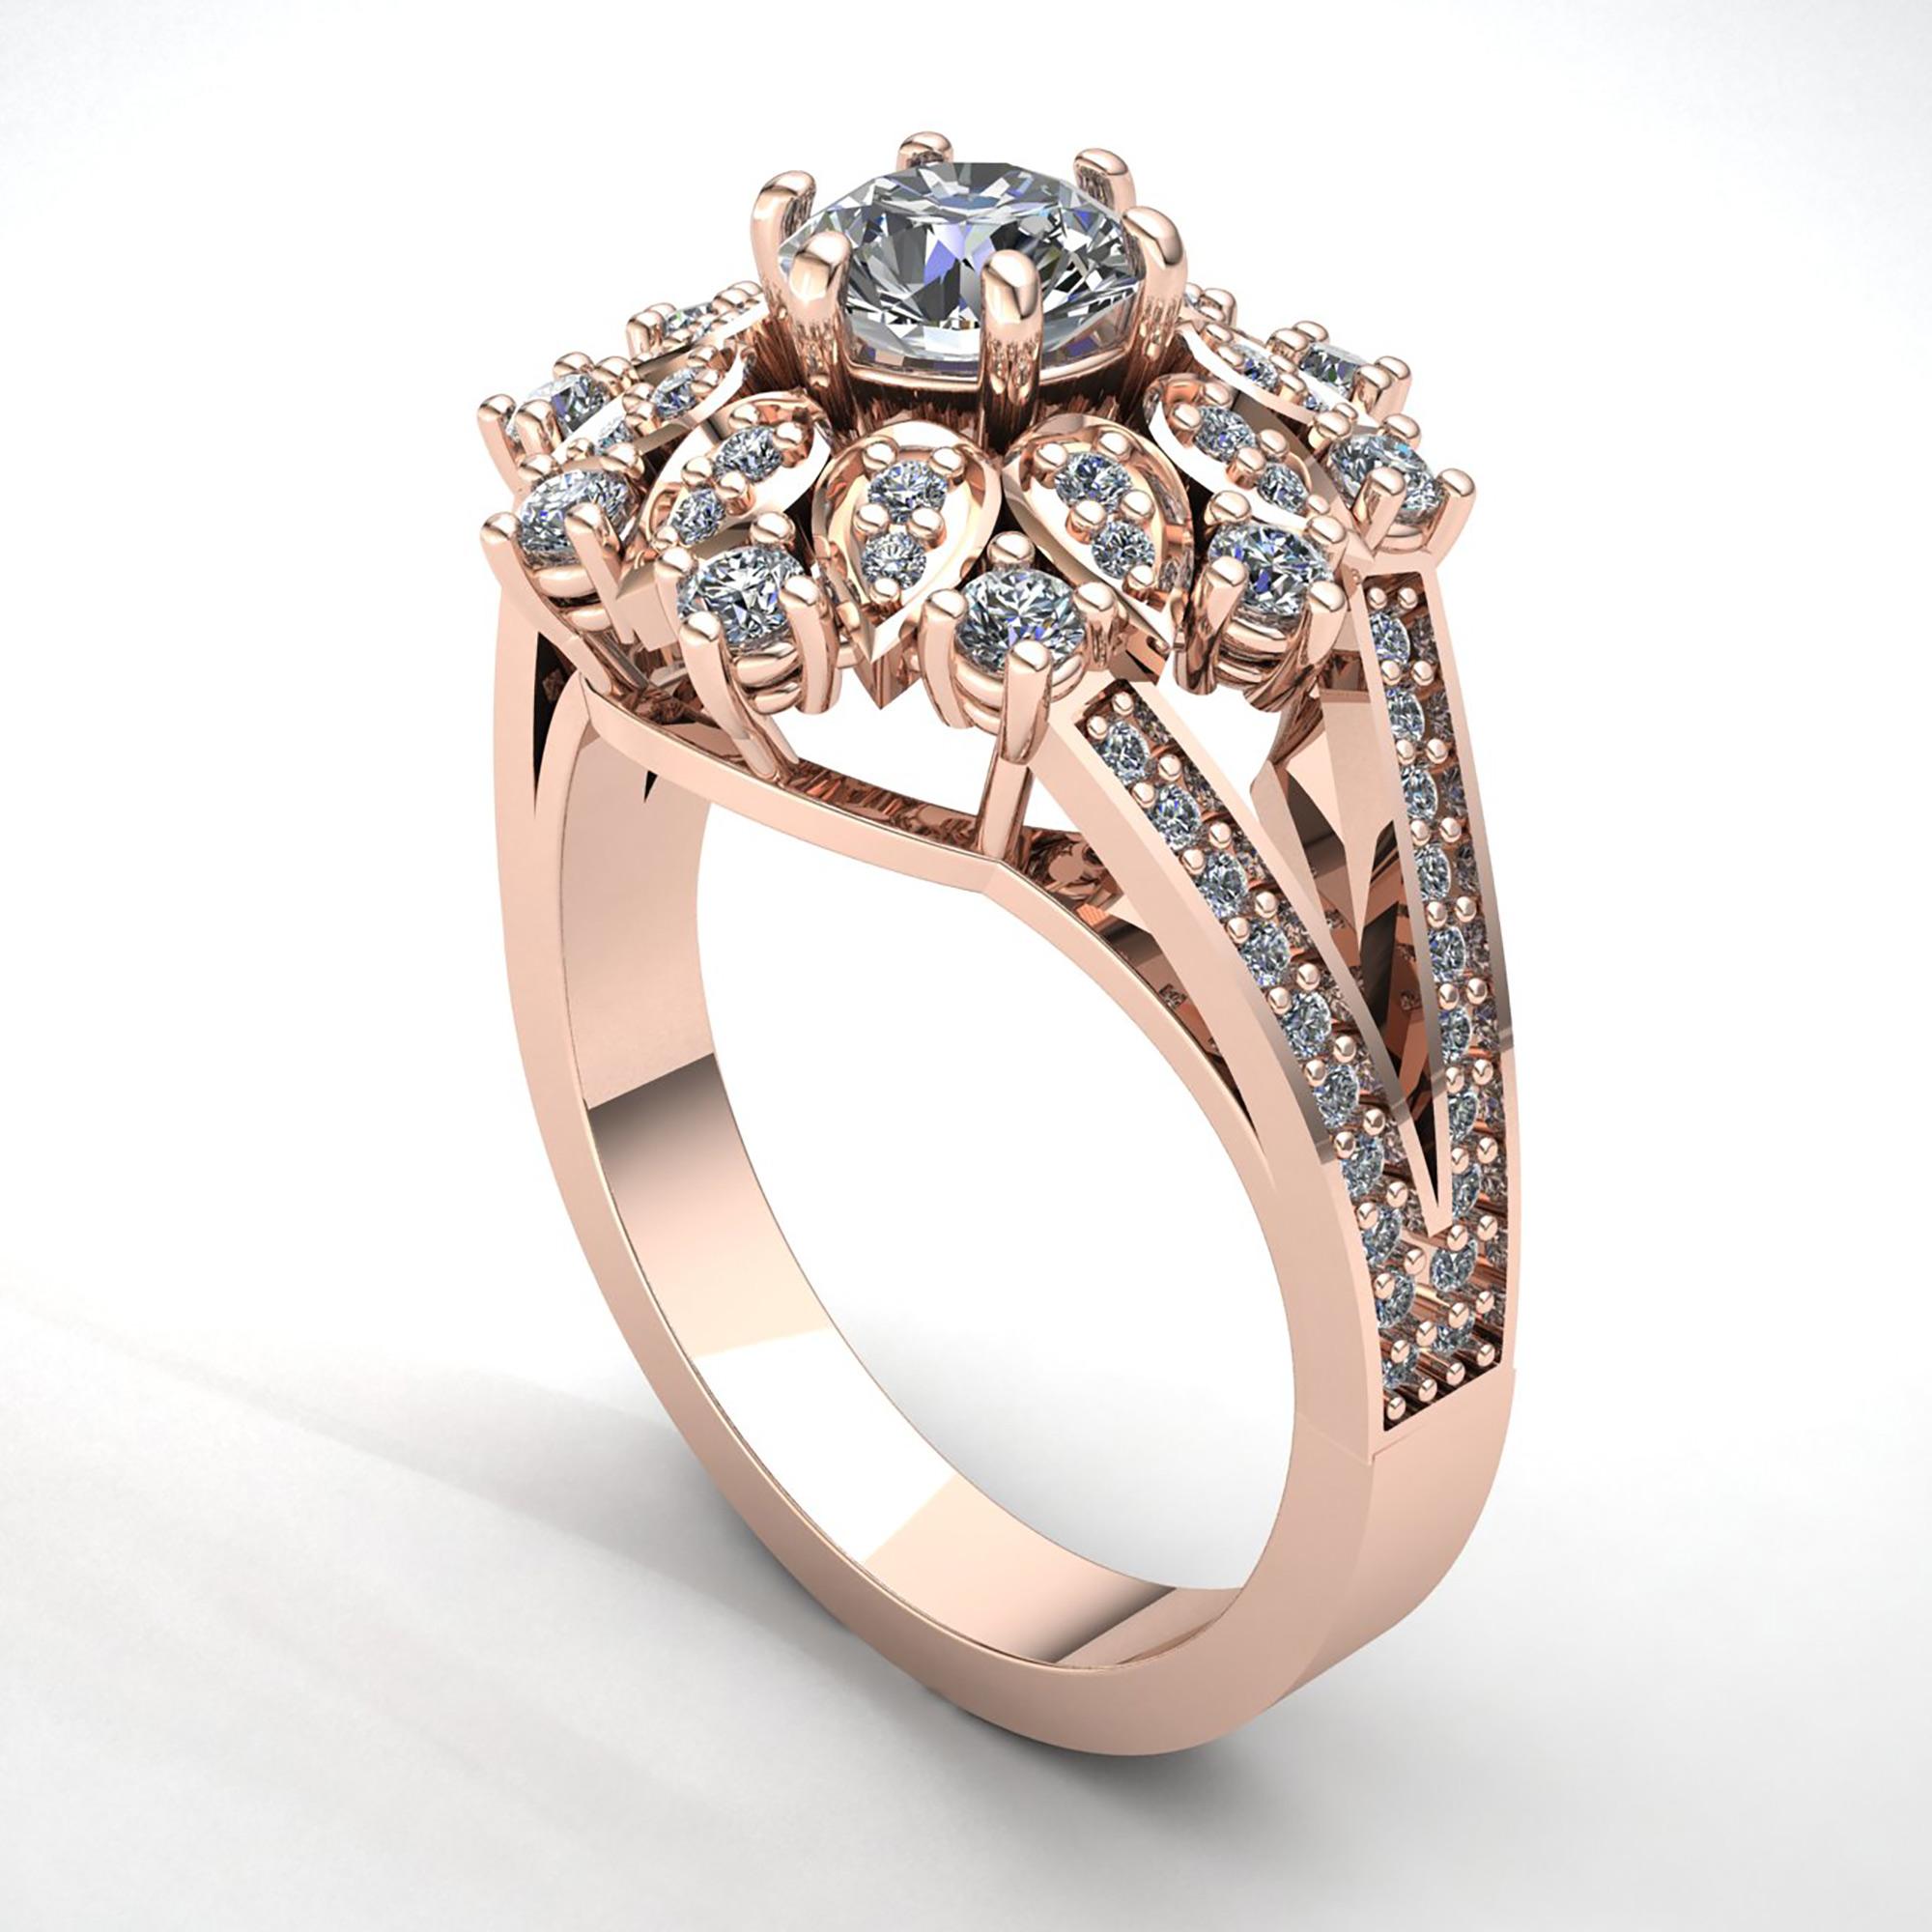 Q Significa En Espanol Wedding Ring